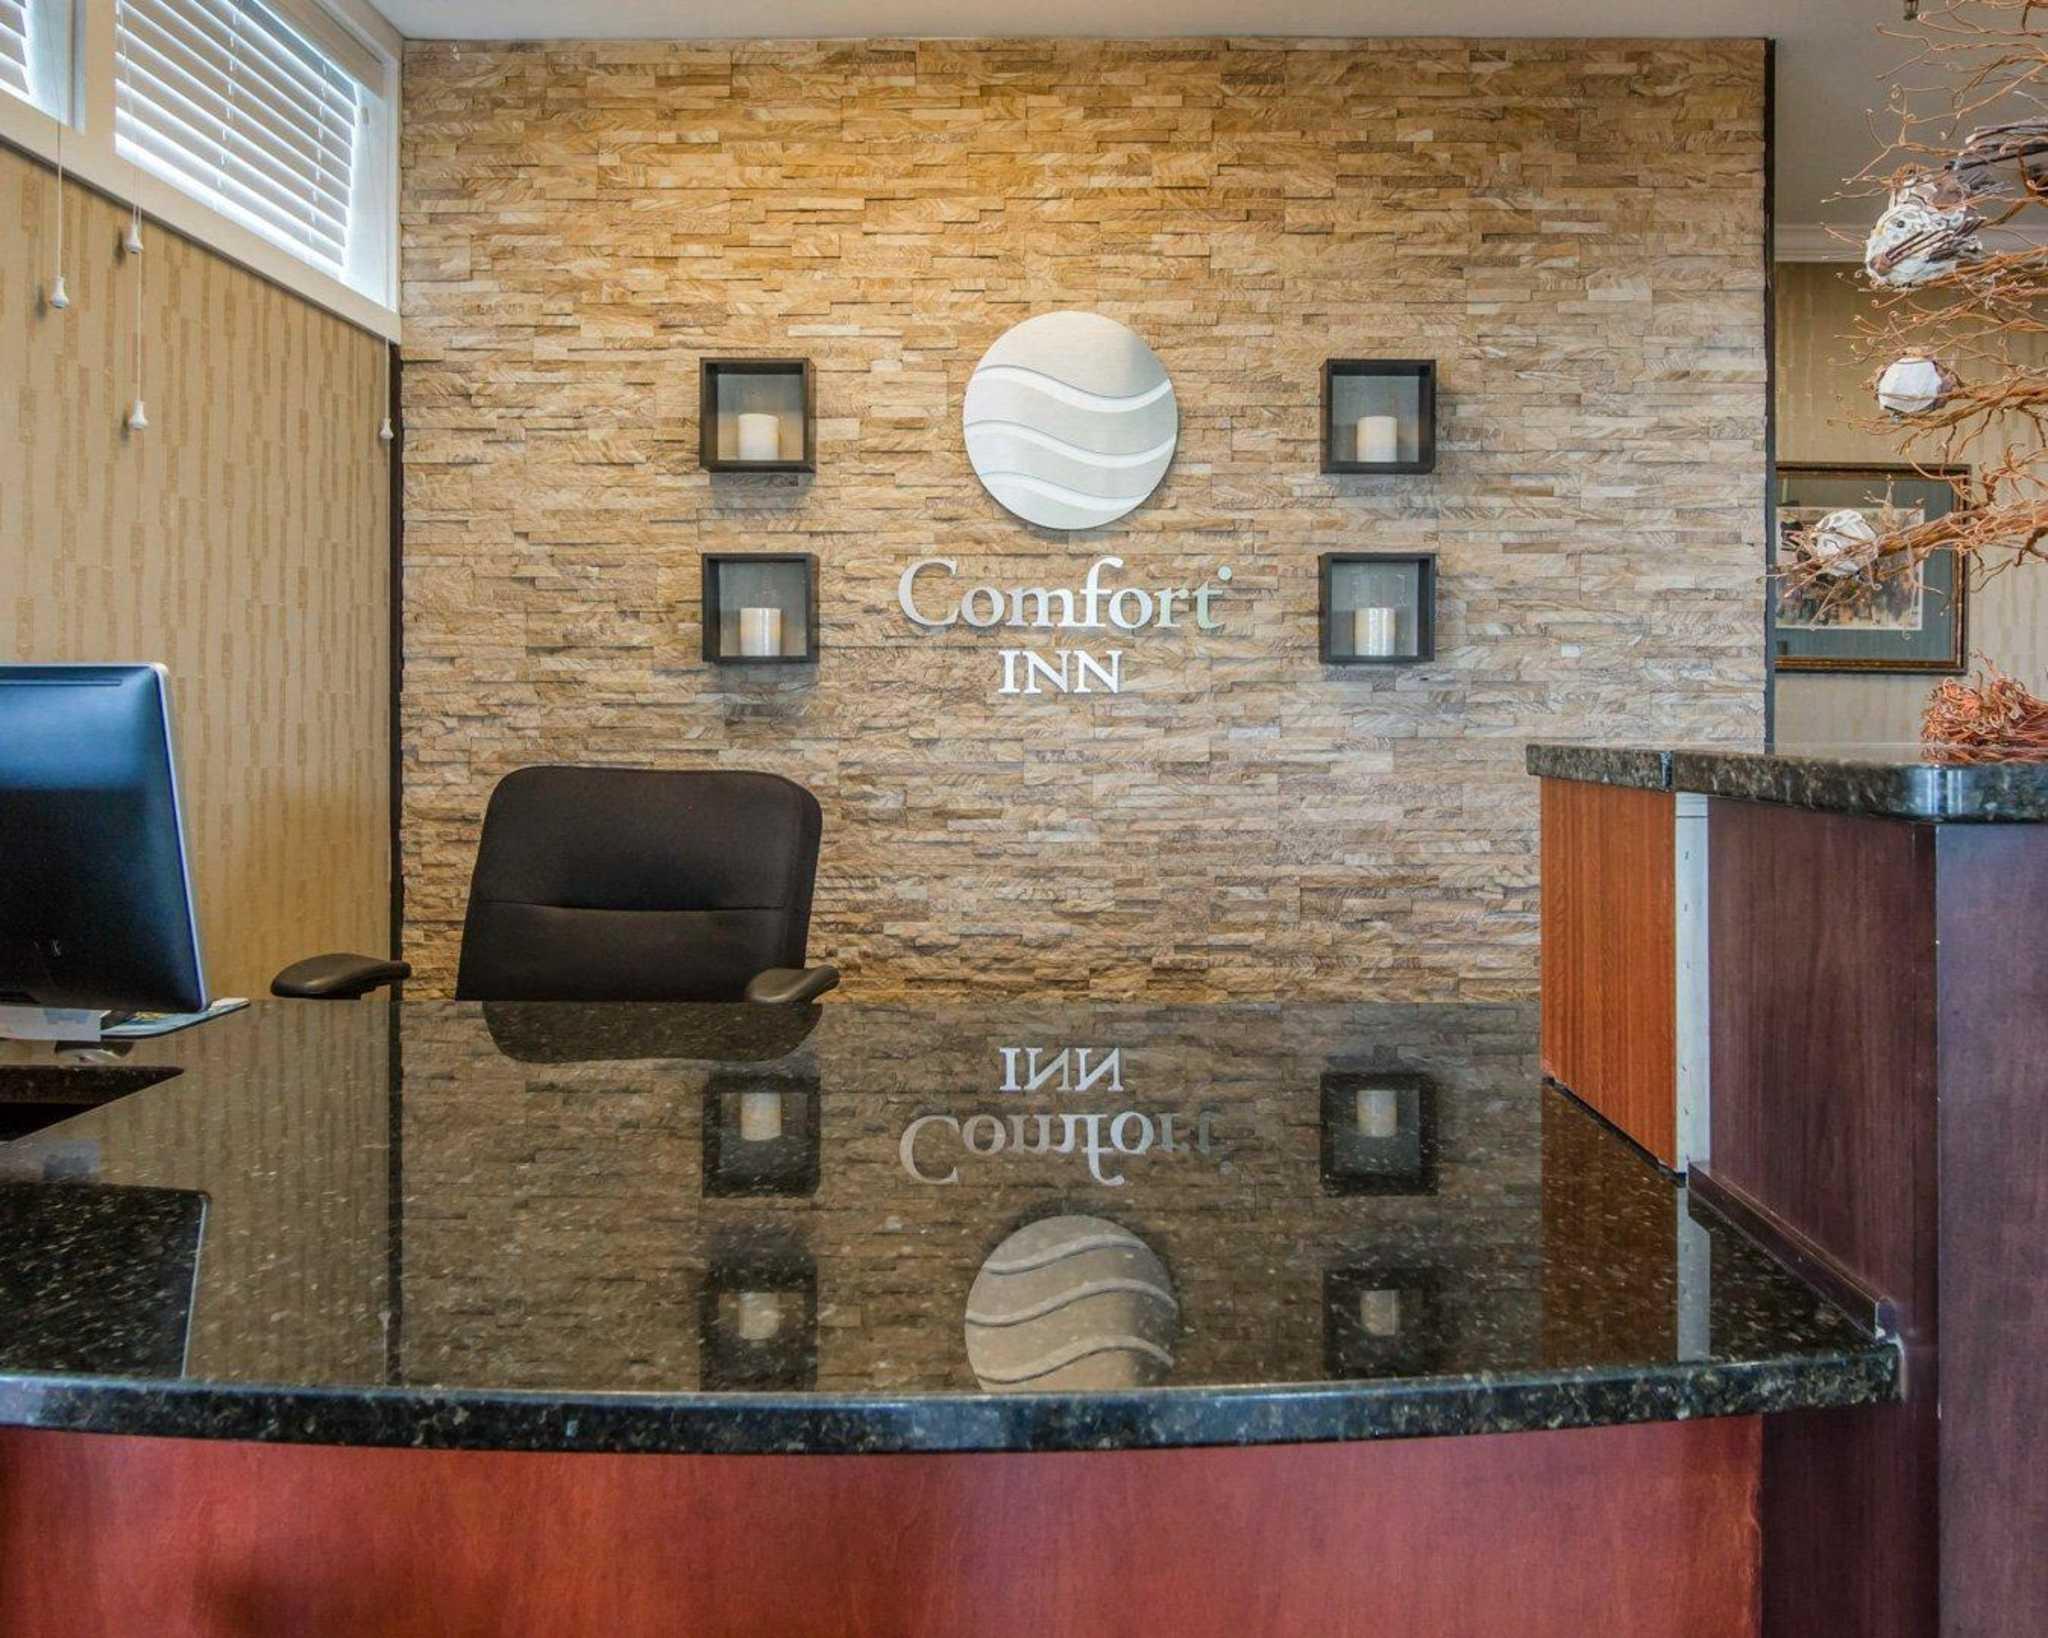 Comfort Inn Apple Valley image 22